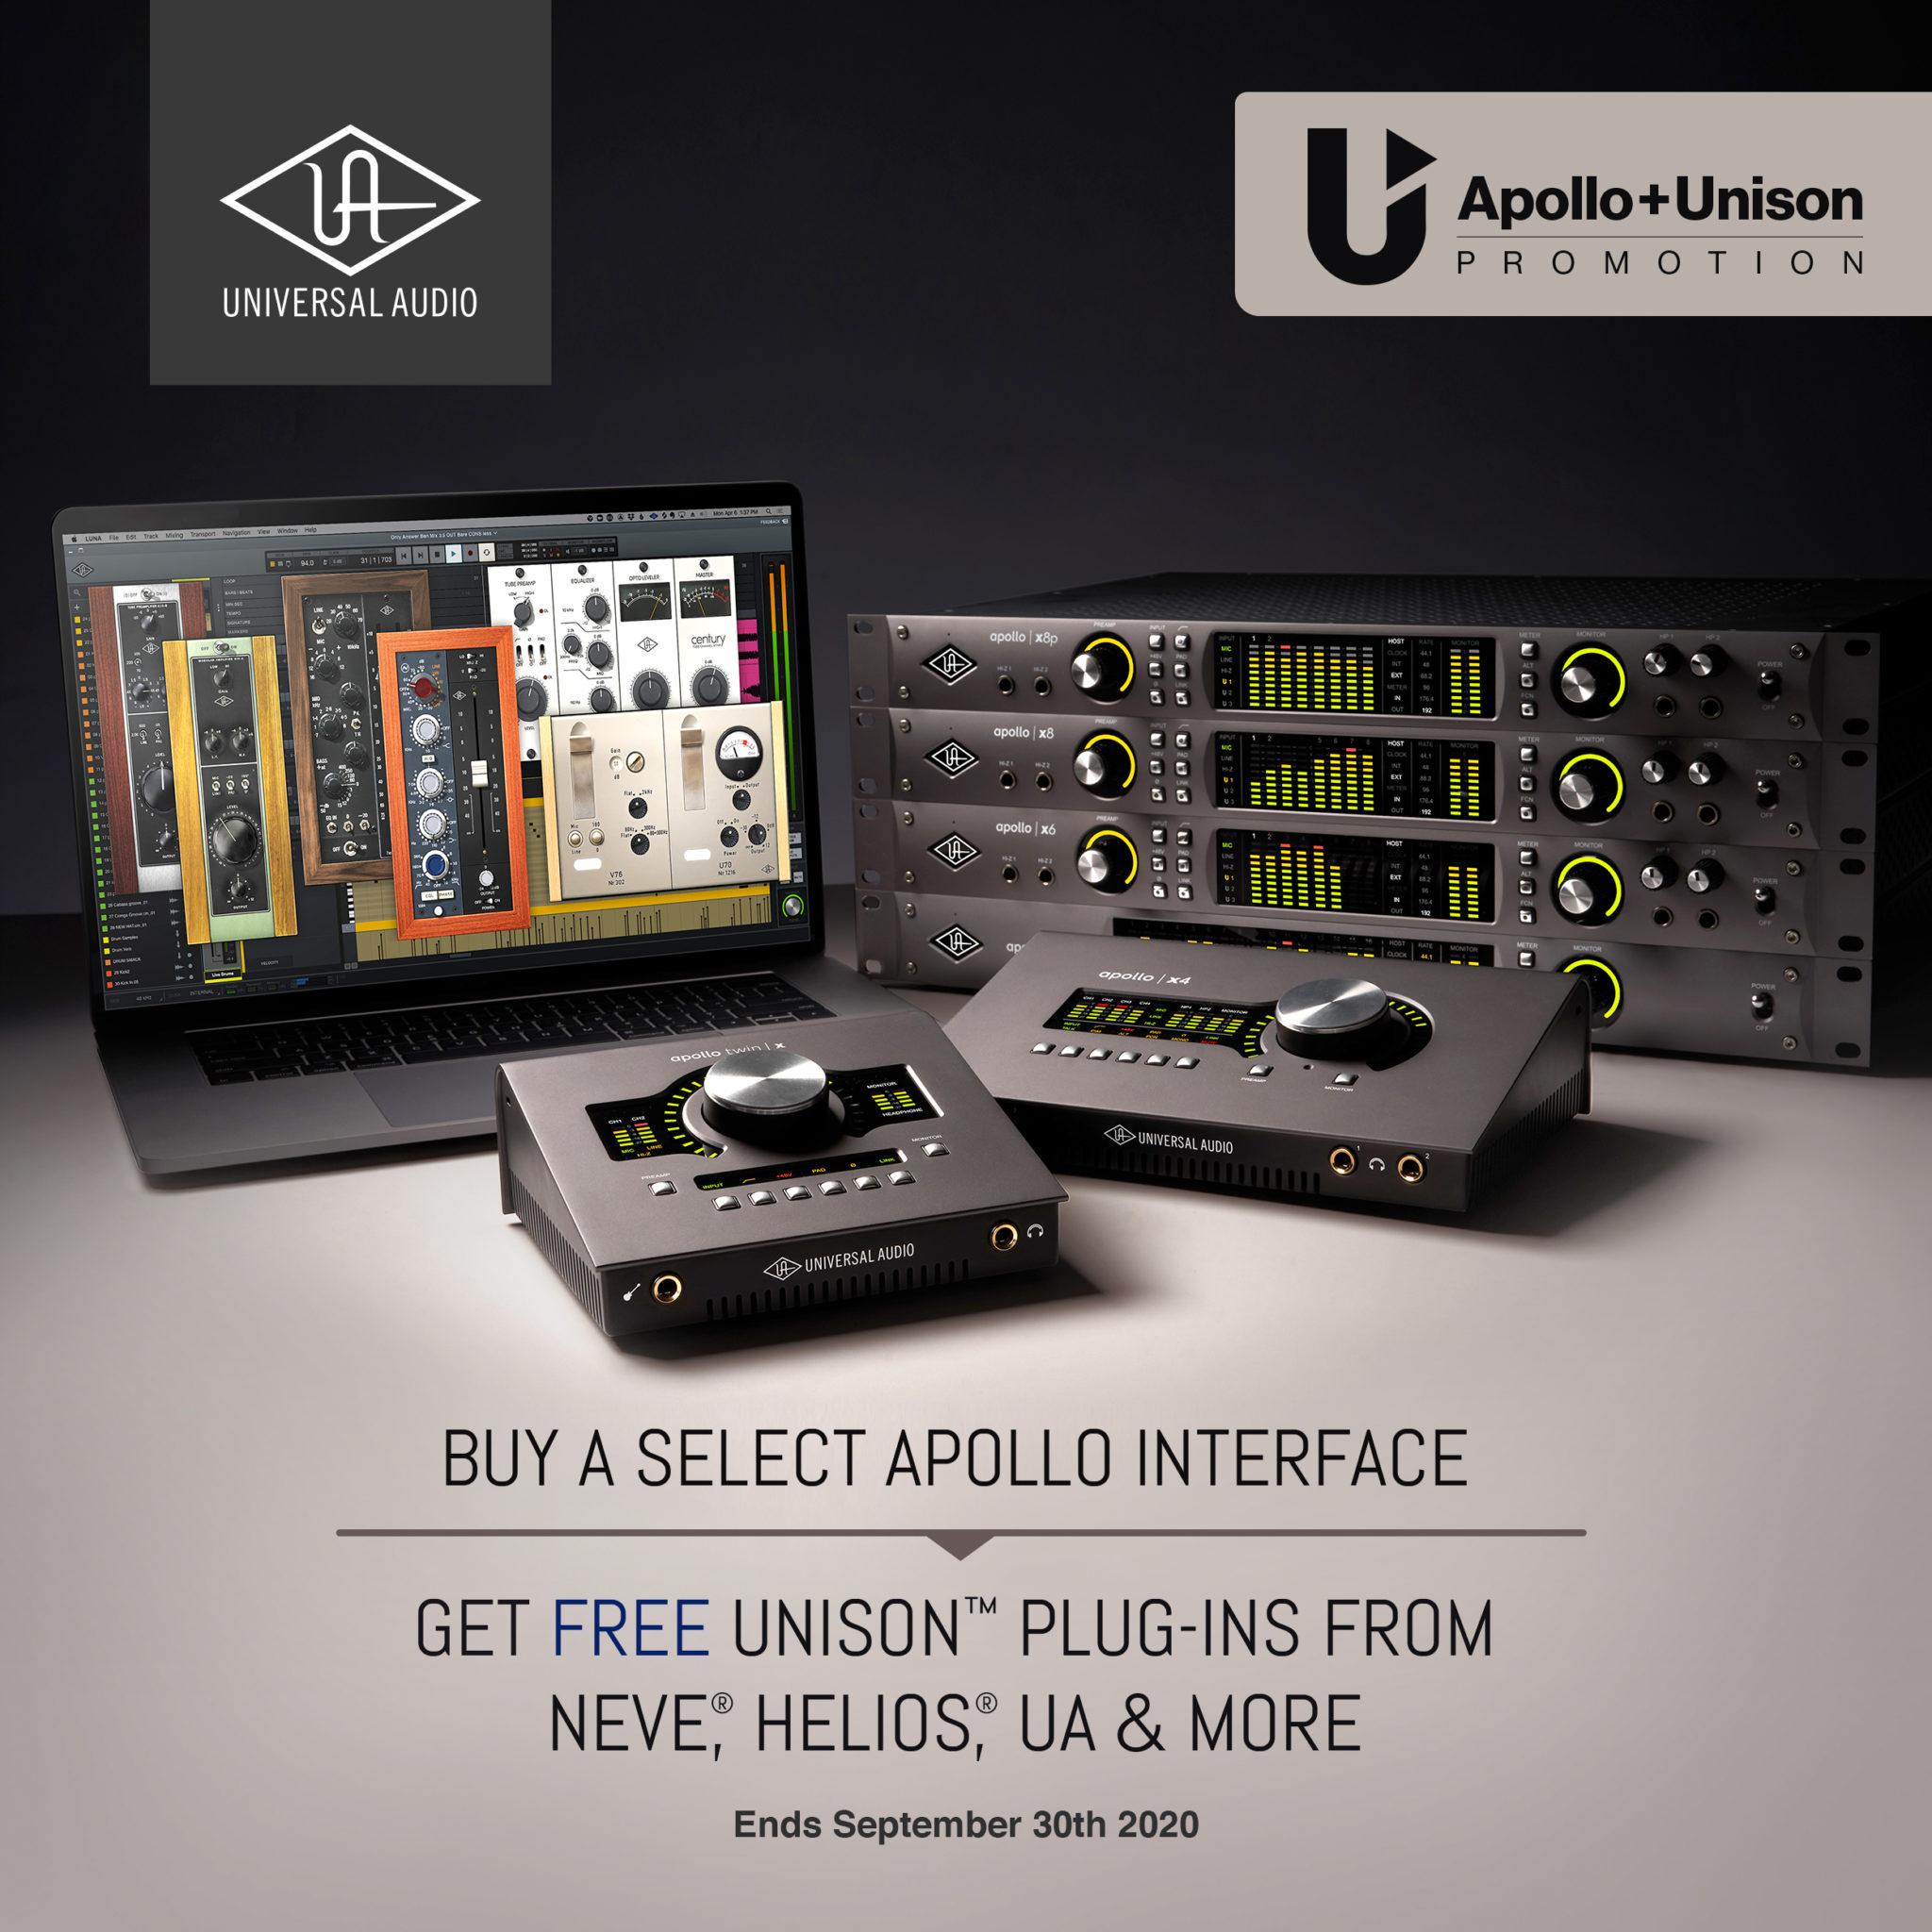 universal-audio-kampanja-unison